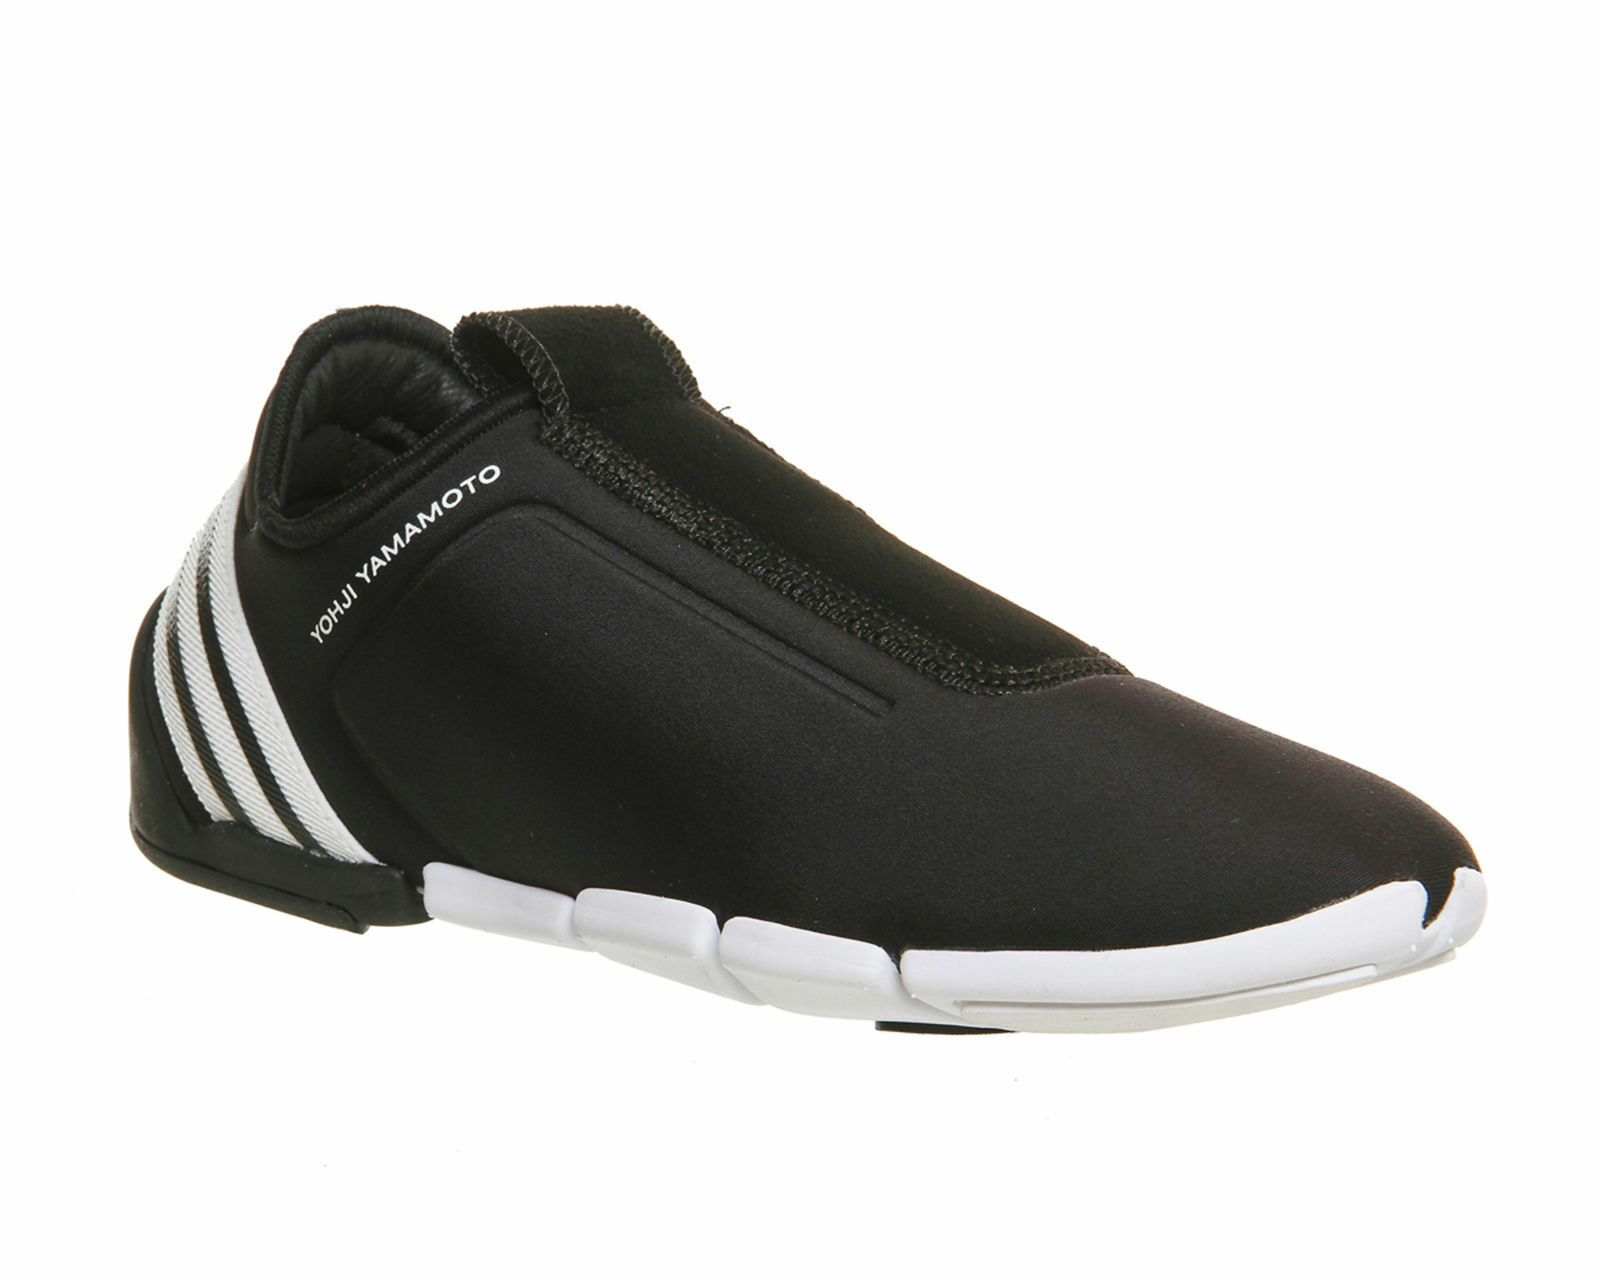 Woman Y3 MEI Li Stretch Yohji Trainer Yamamoto Black White Sneaker Trainer Yohji UK Size 4-5 9e9f74